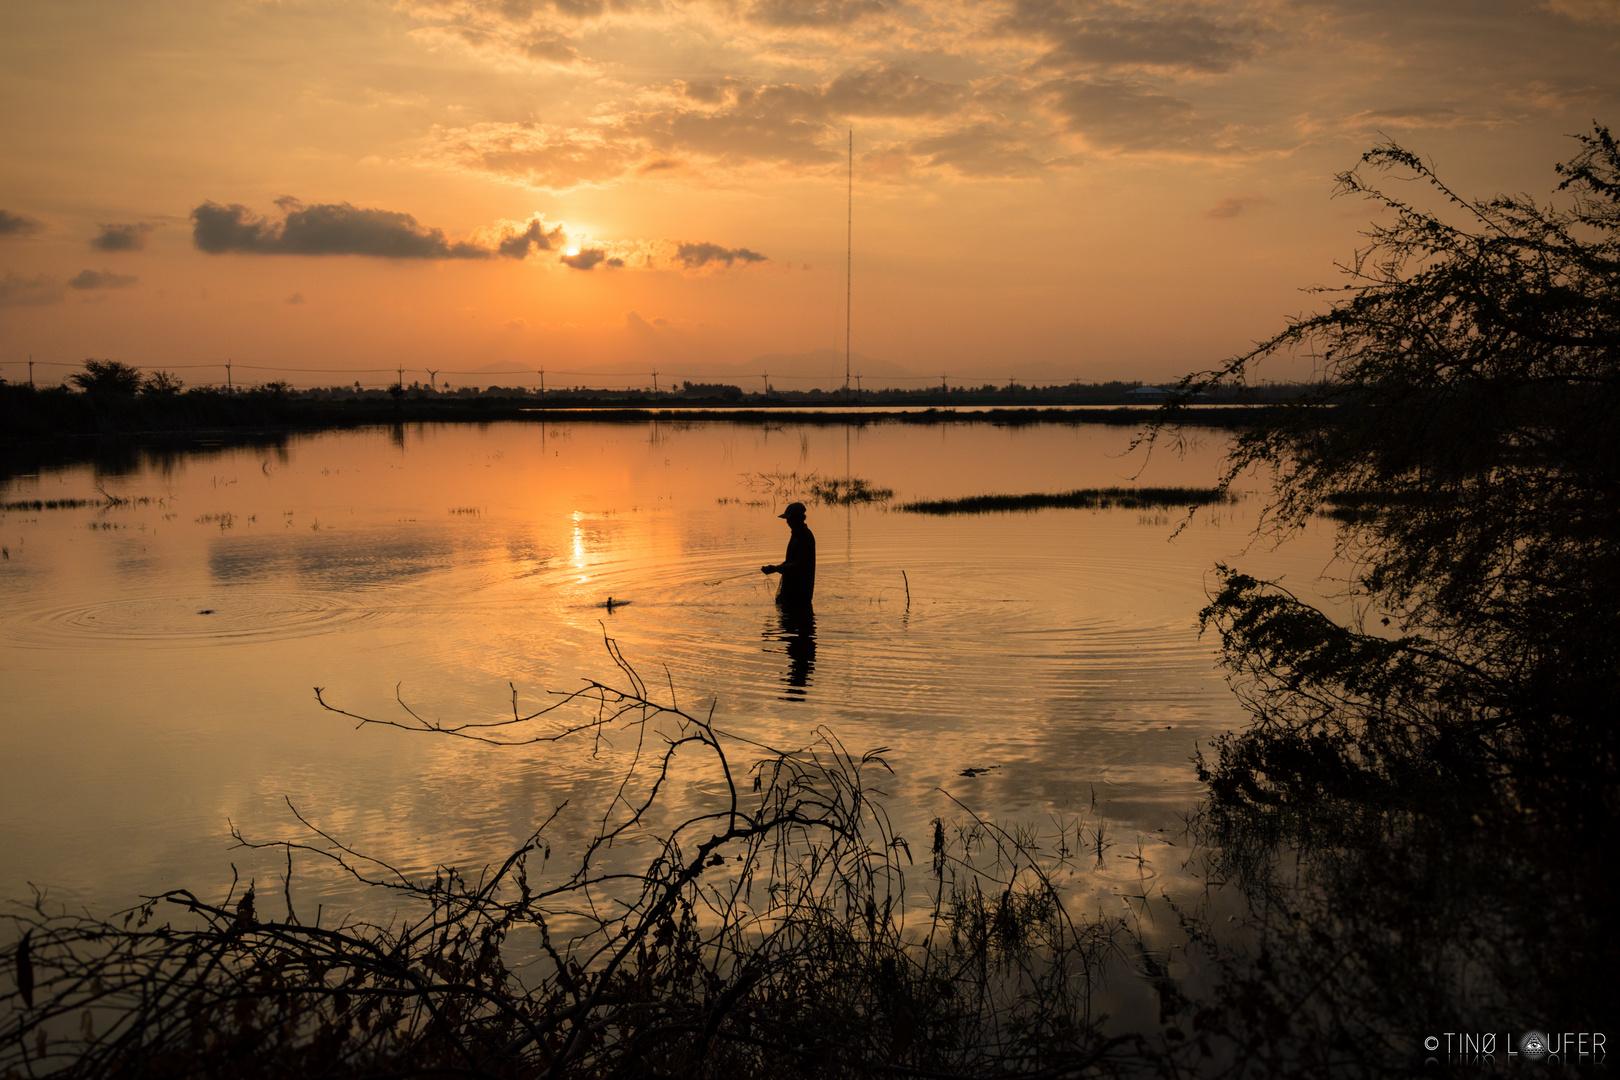 Sunset in Prachuap Khiri Khan, Thailand